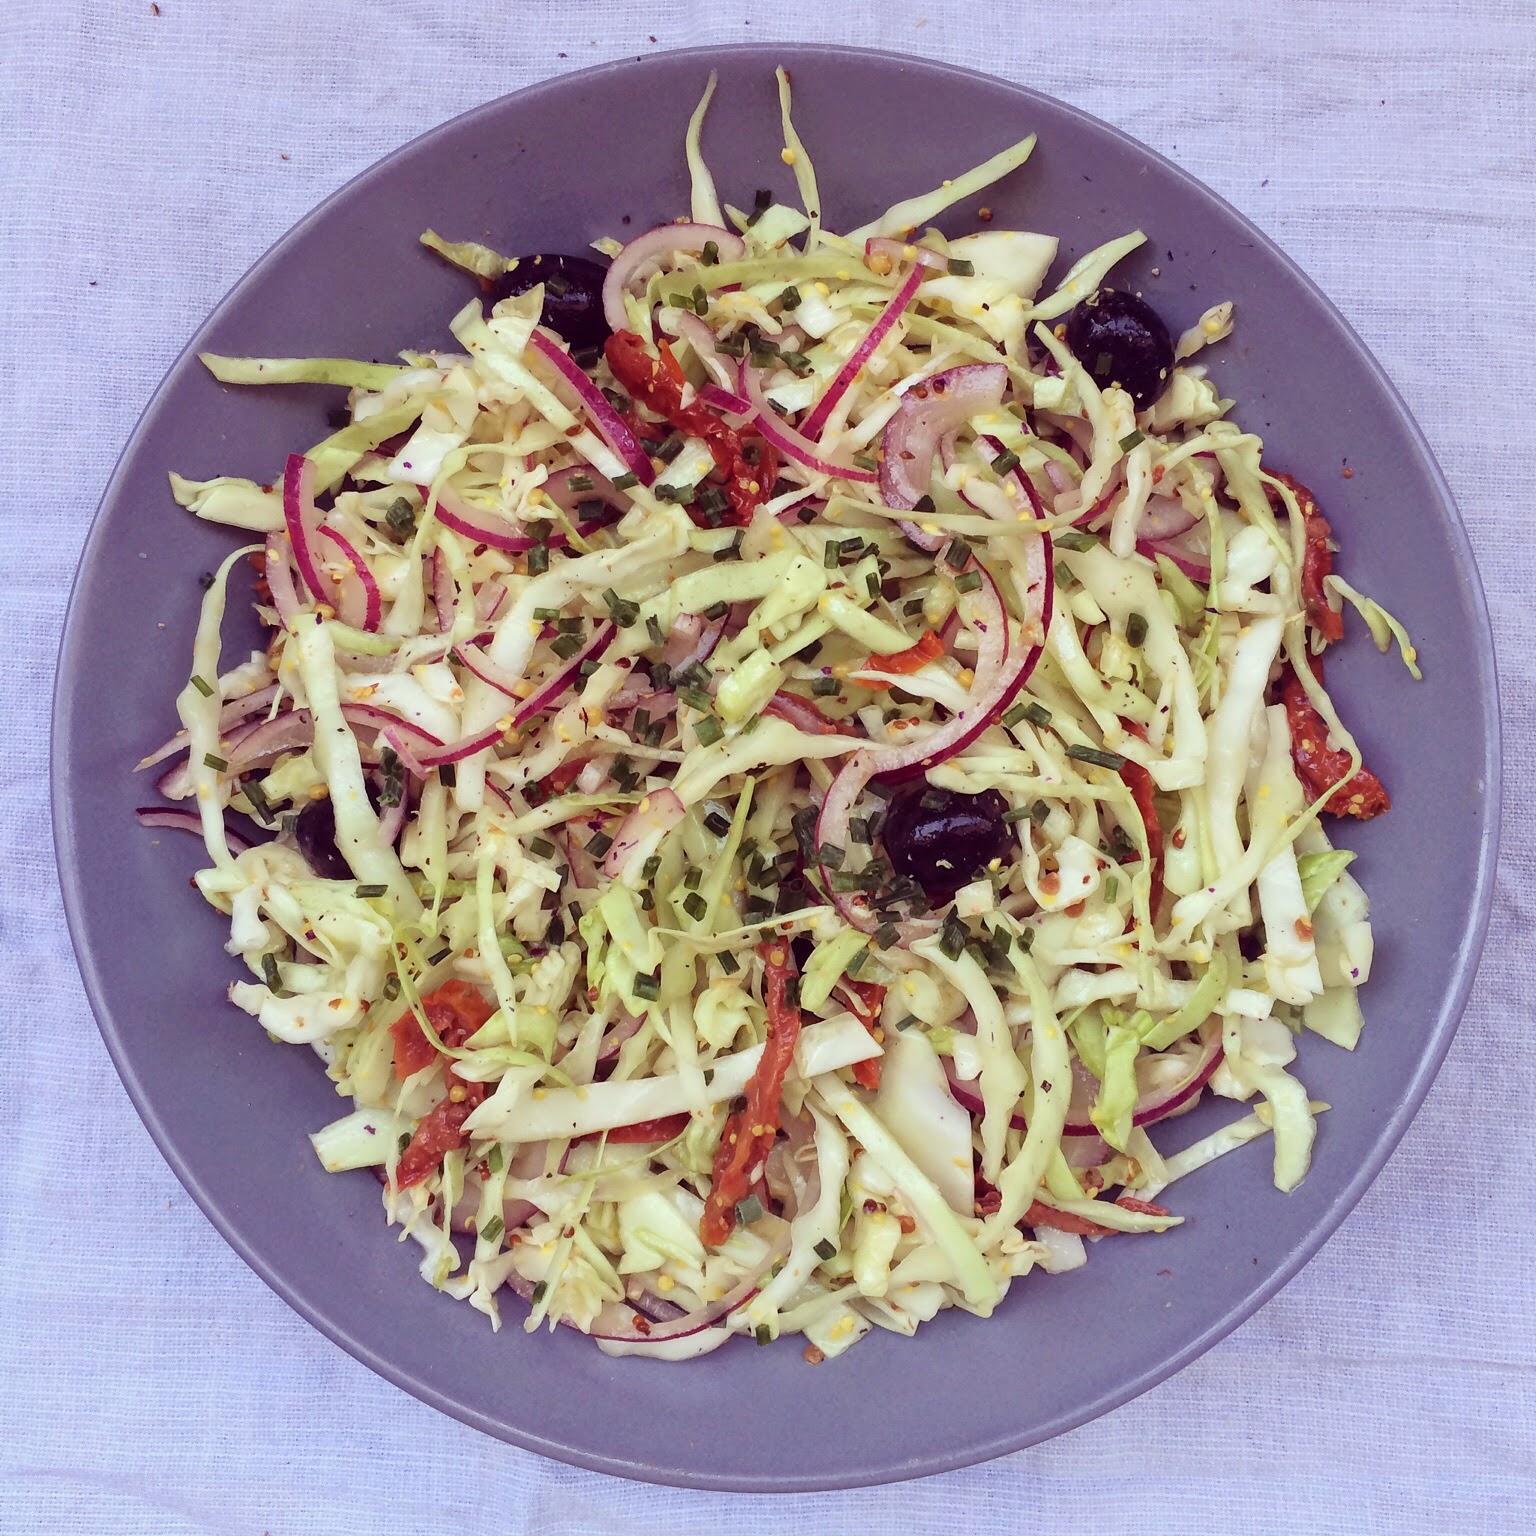 salade chou blanc olives tomates séchées